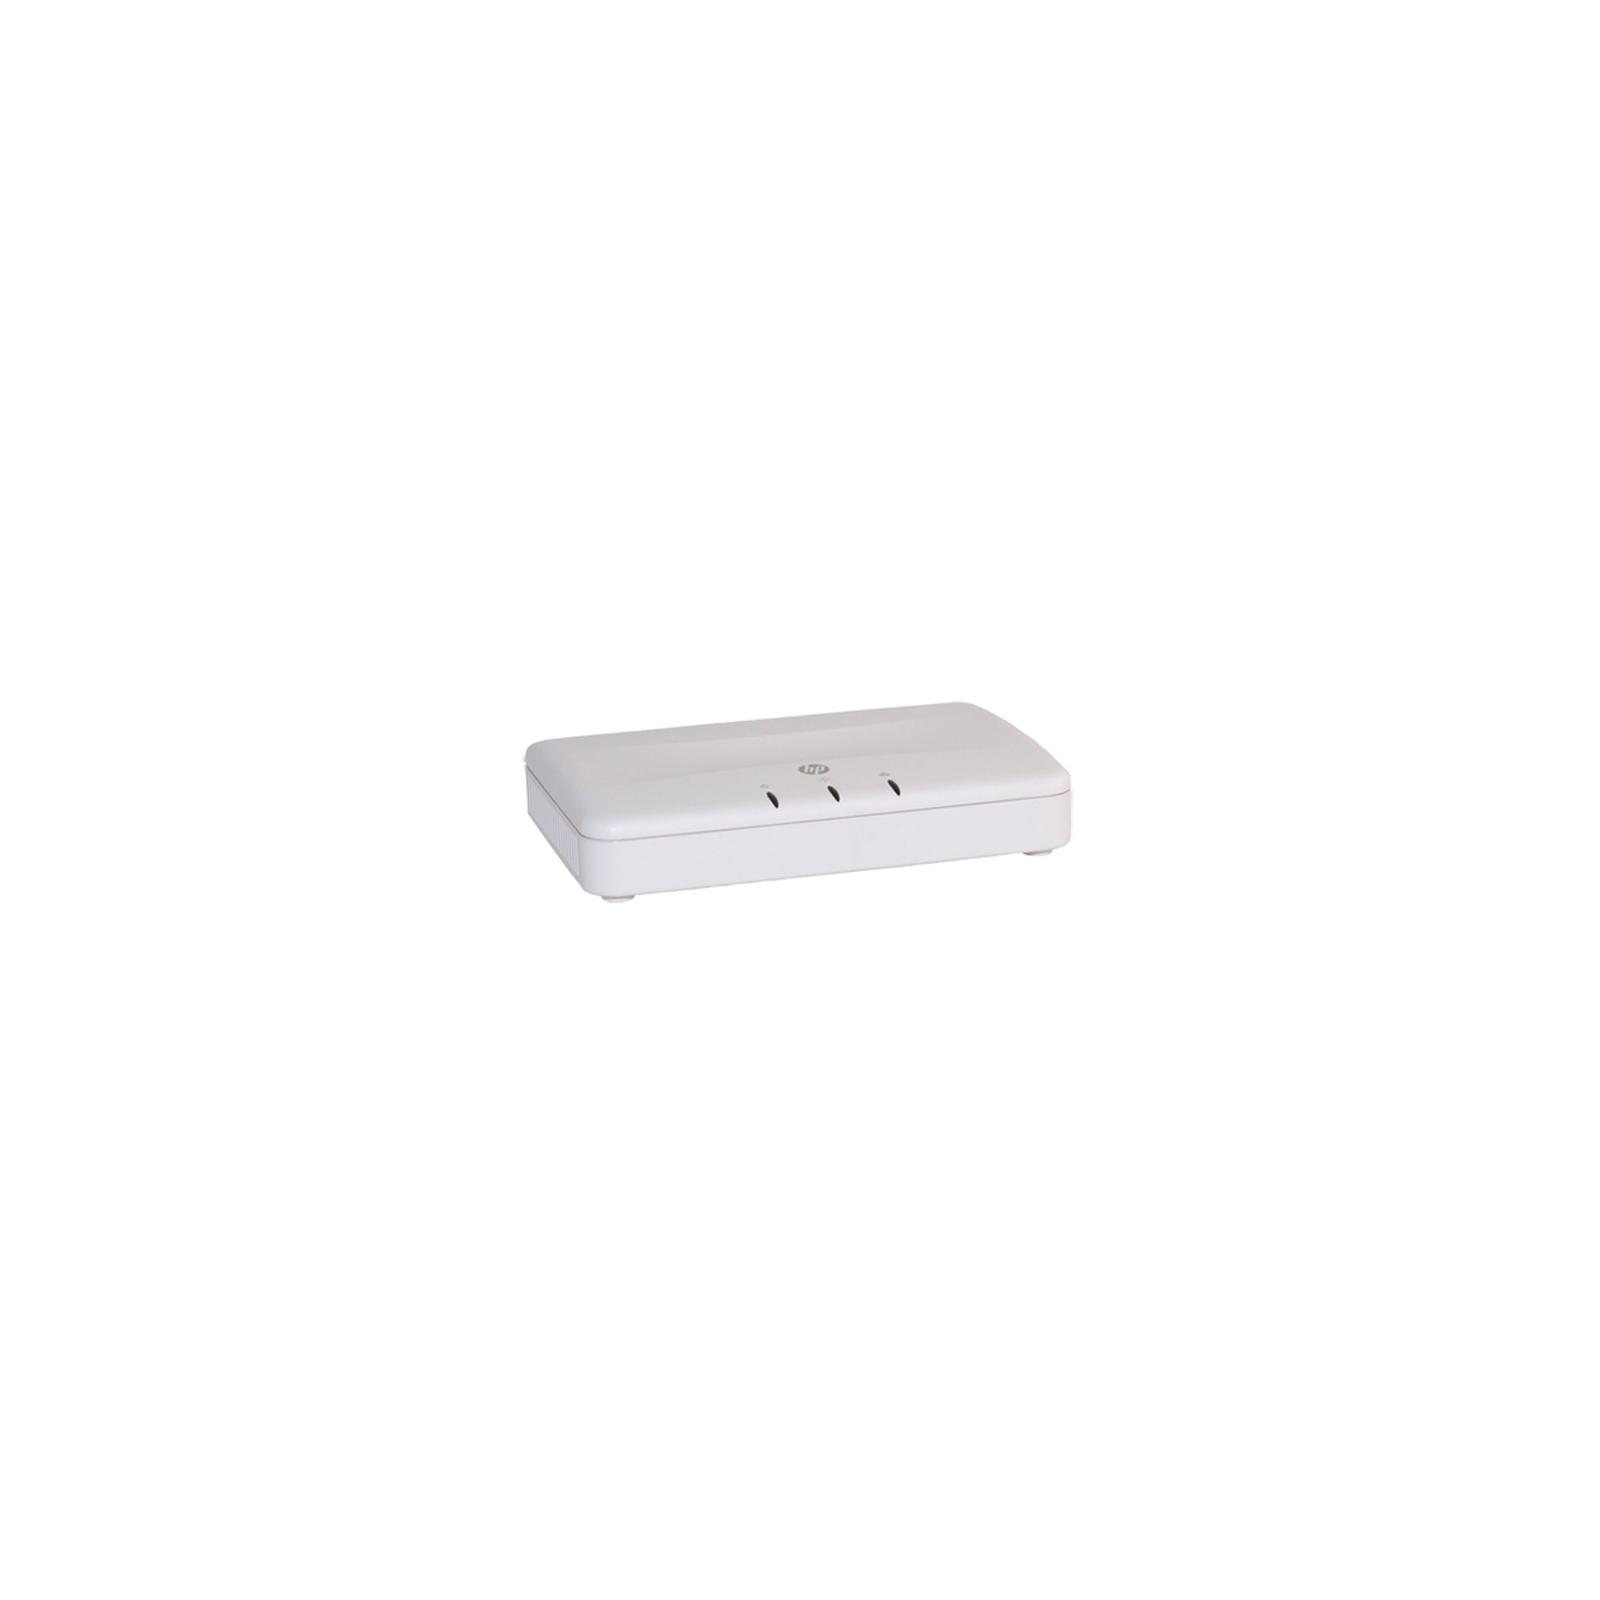 Точка доступа Wi-Fi HP M220 (J9799A)